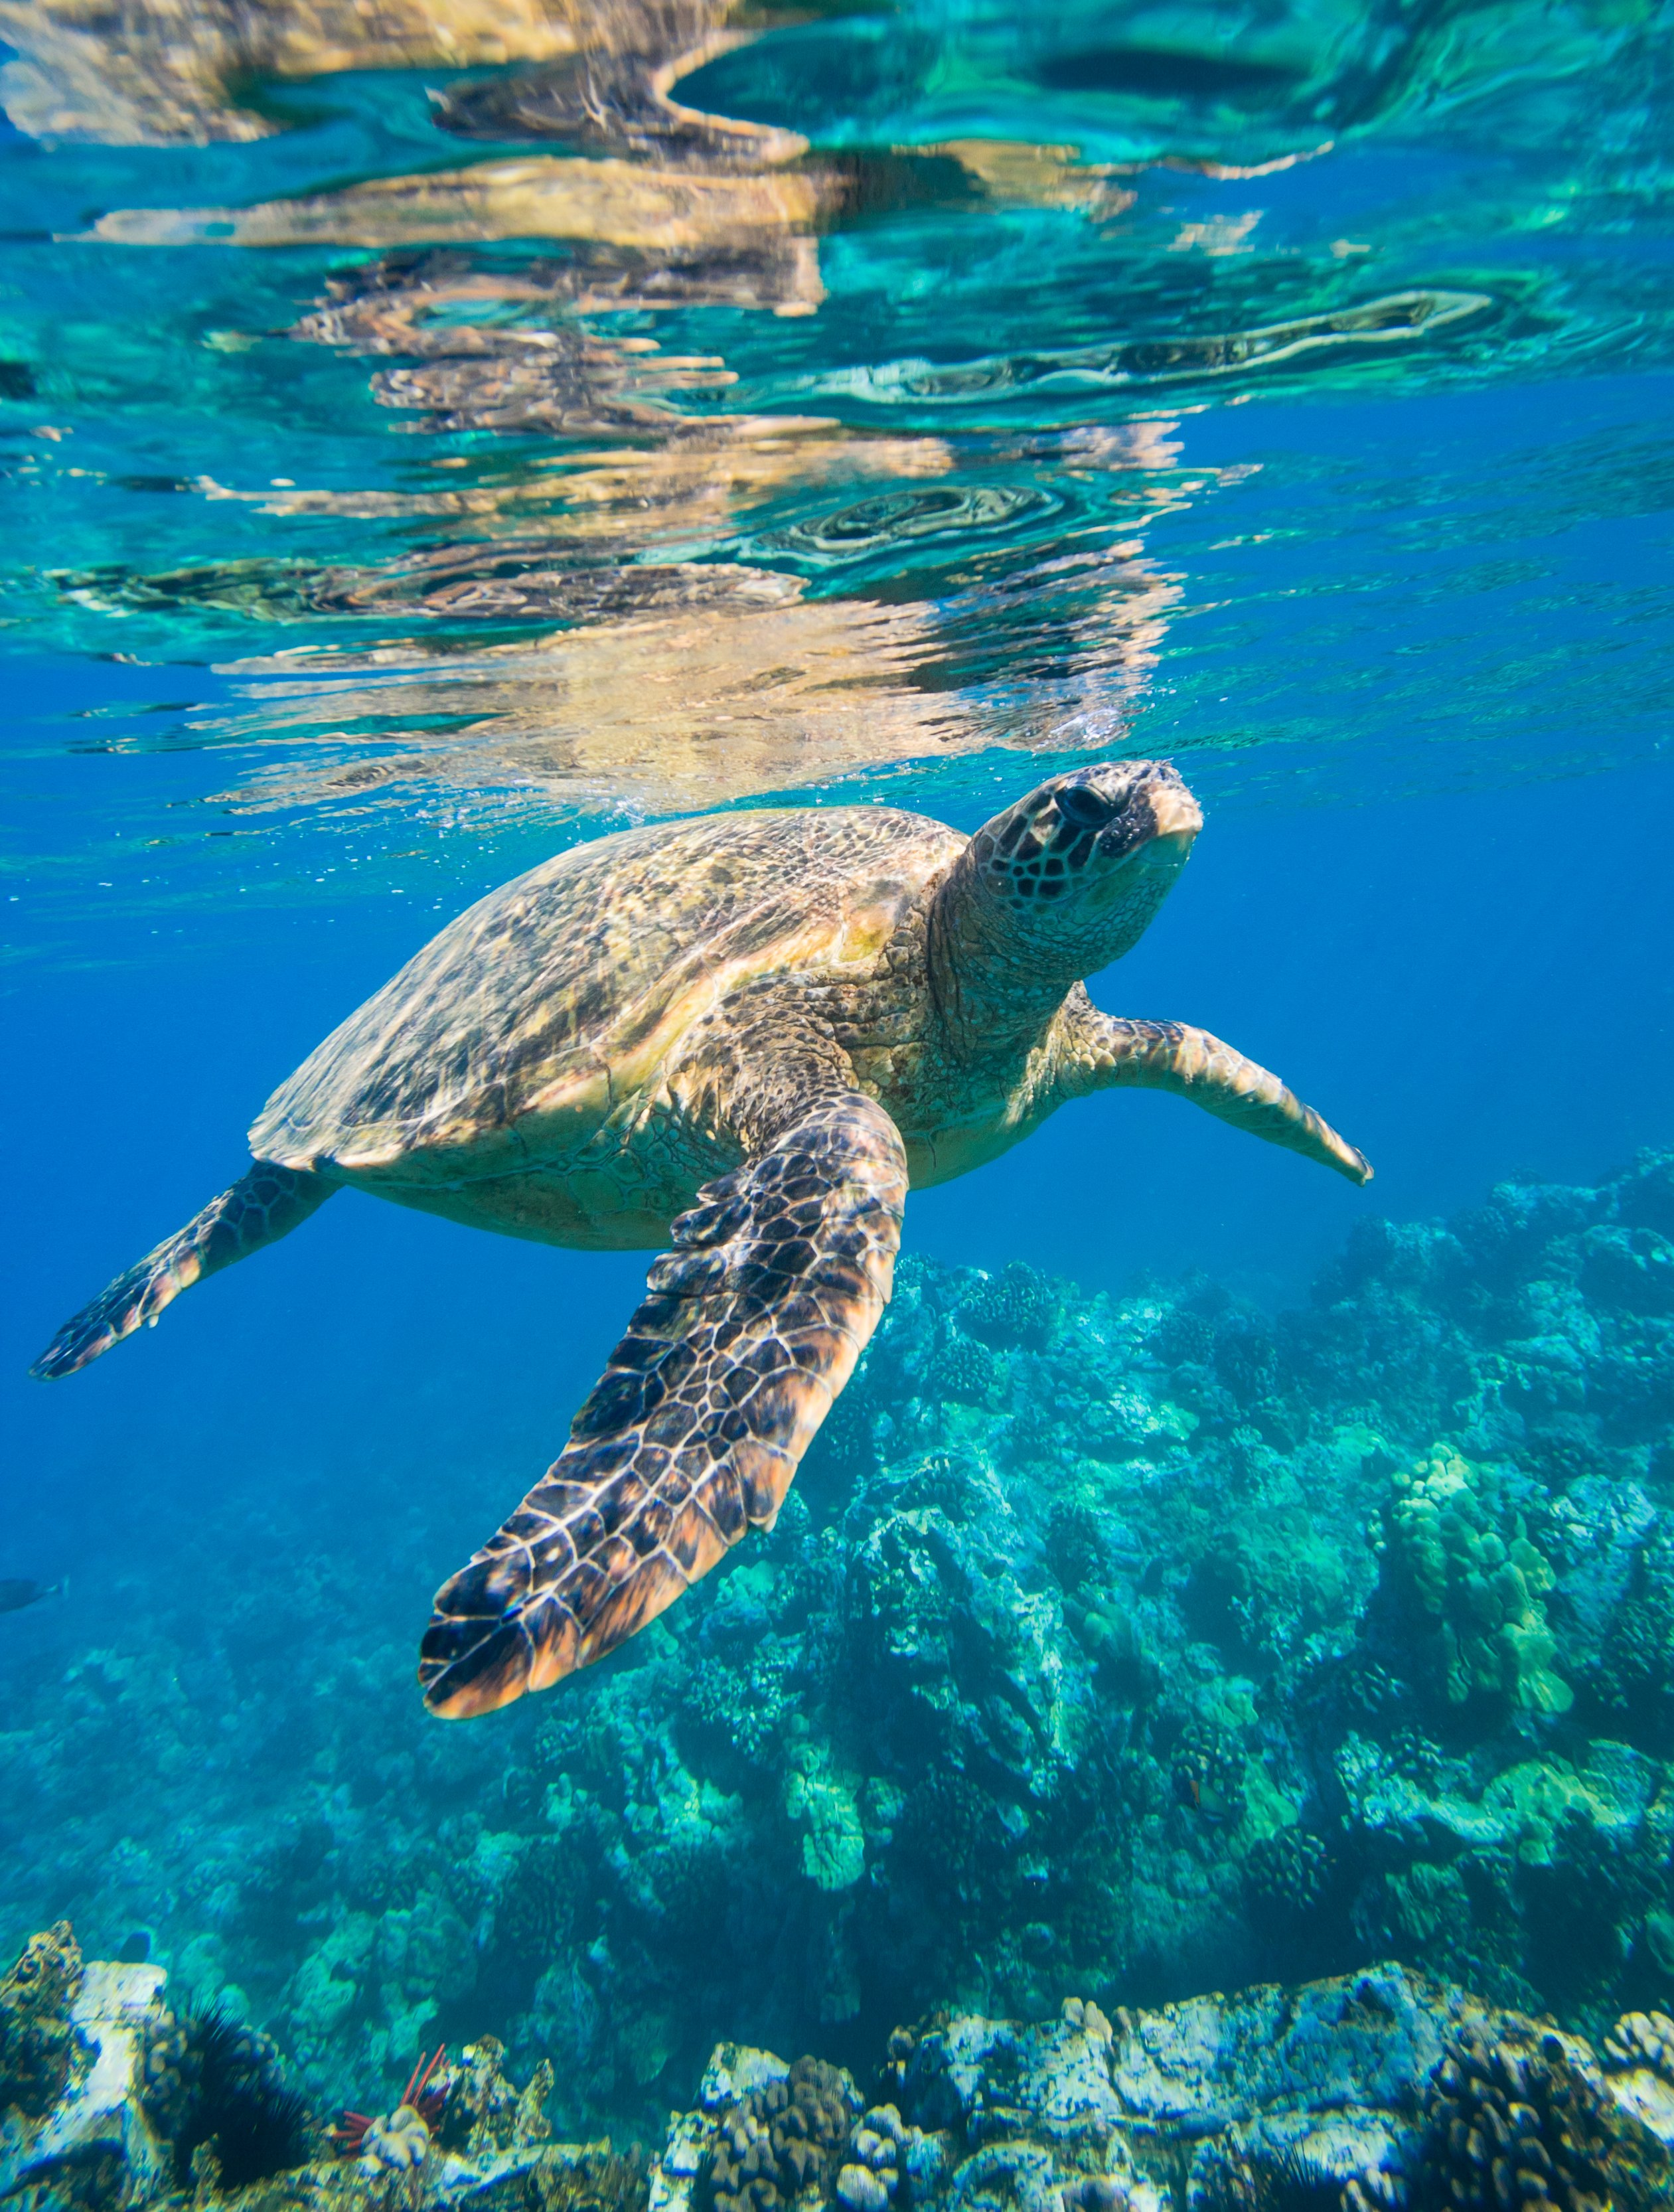 A Hawaiian green sea turtle swims in the ocean in Maui.